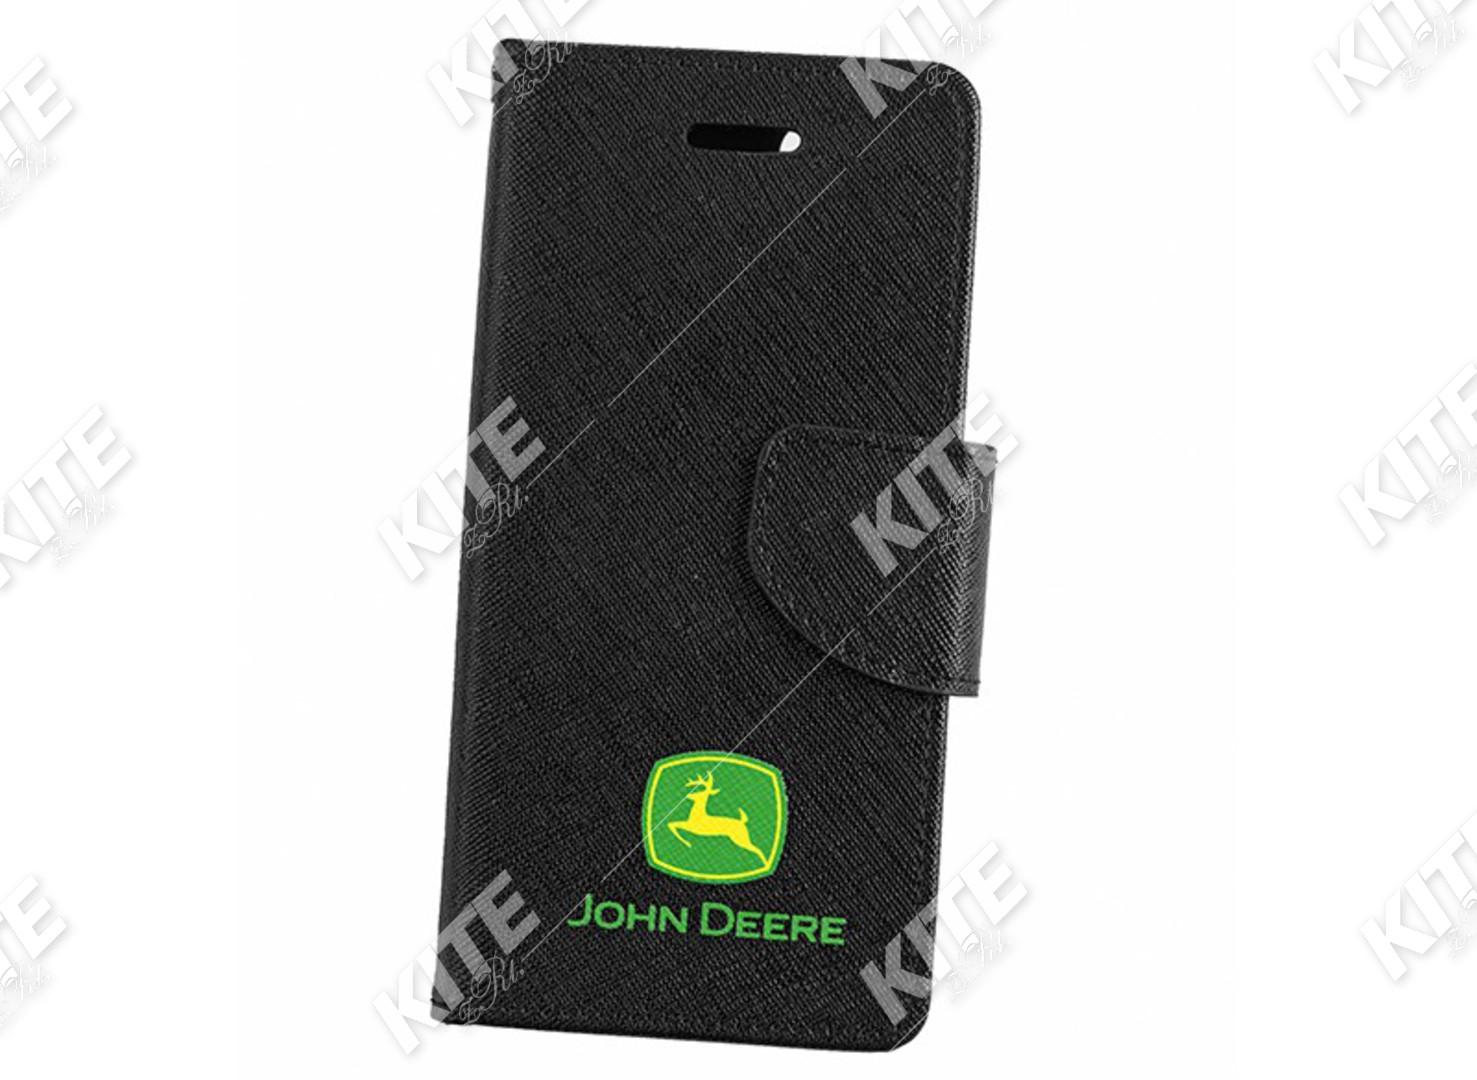 John Deere telefontok (iPhone 7)